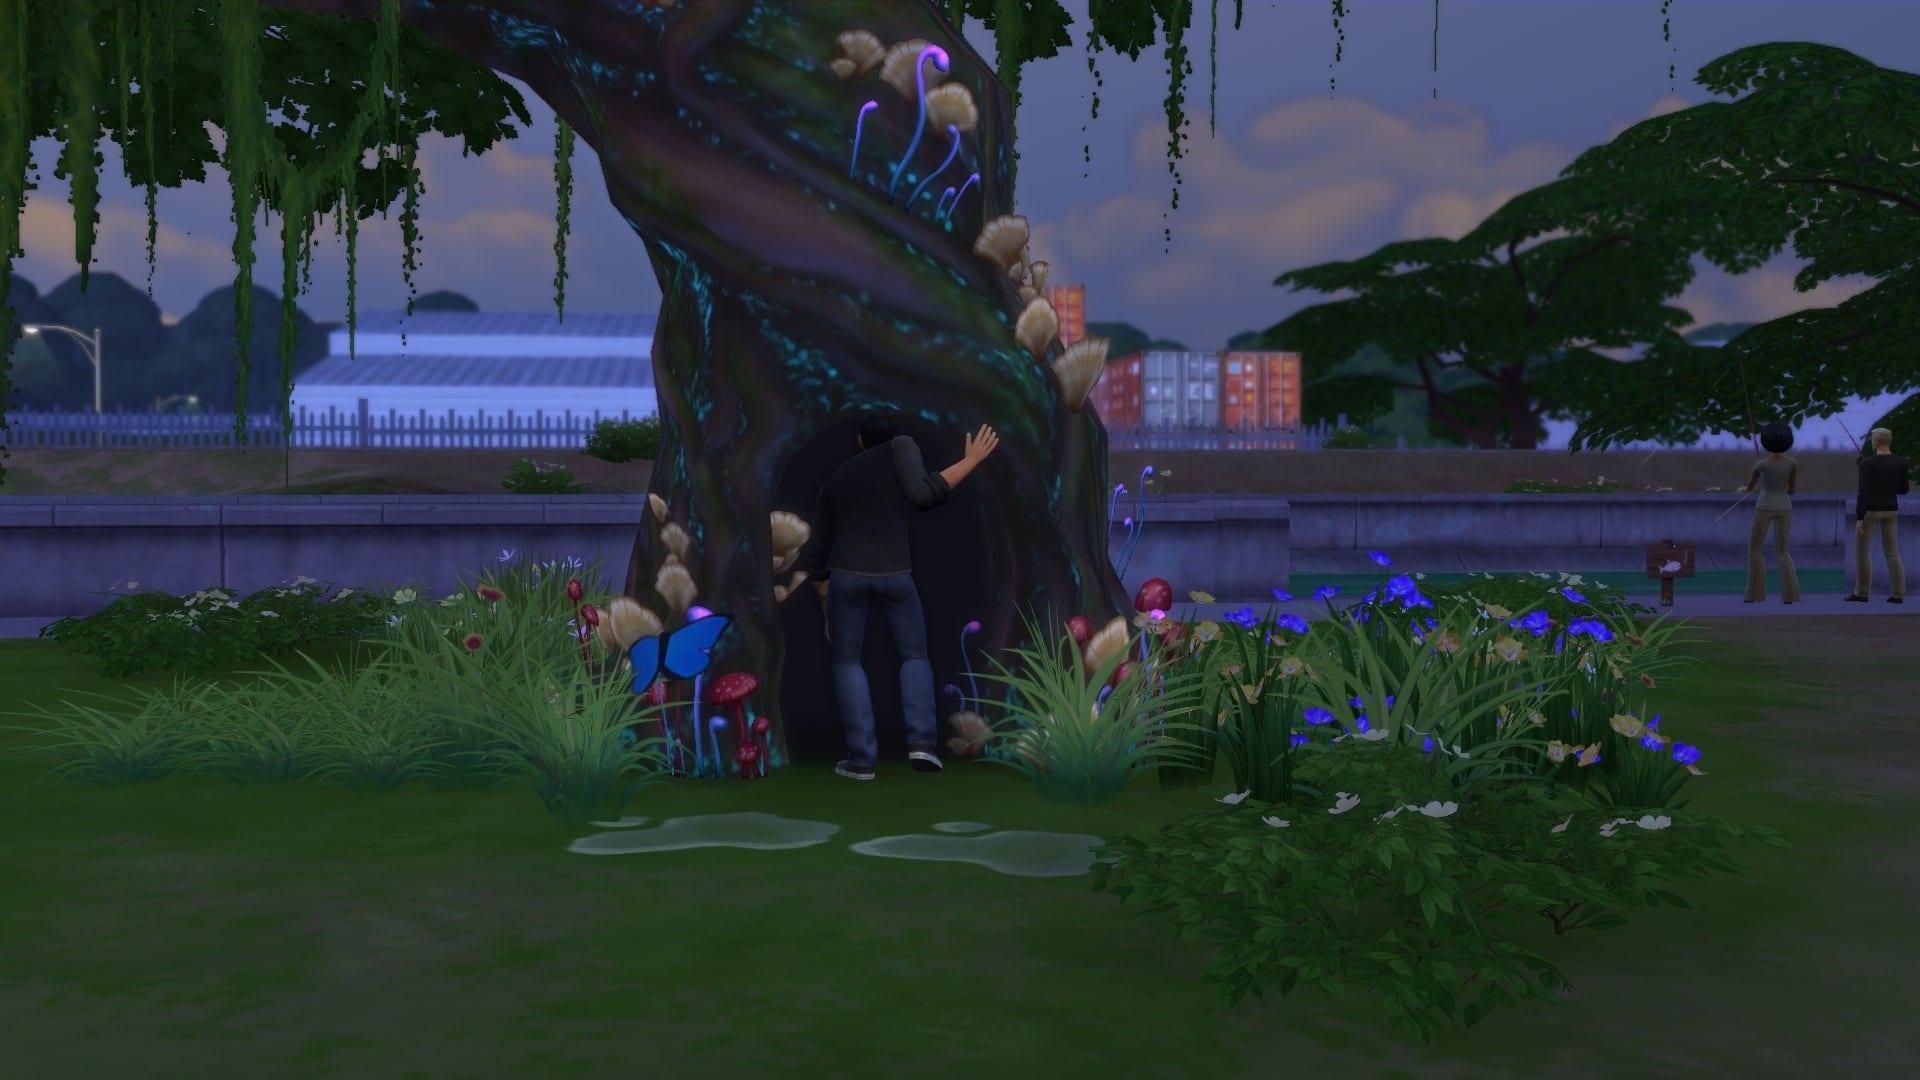 симс 4 волшебные бобы, симс 4 волшебное дерево